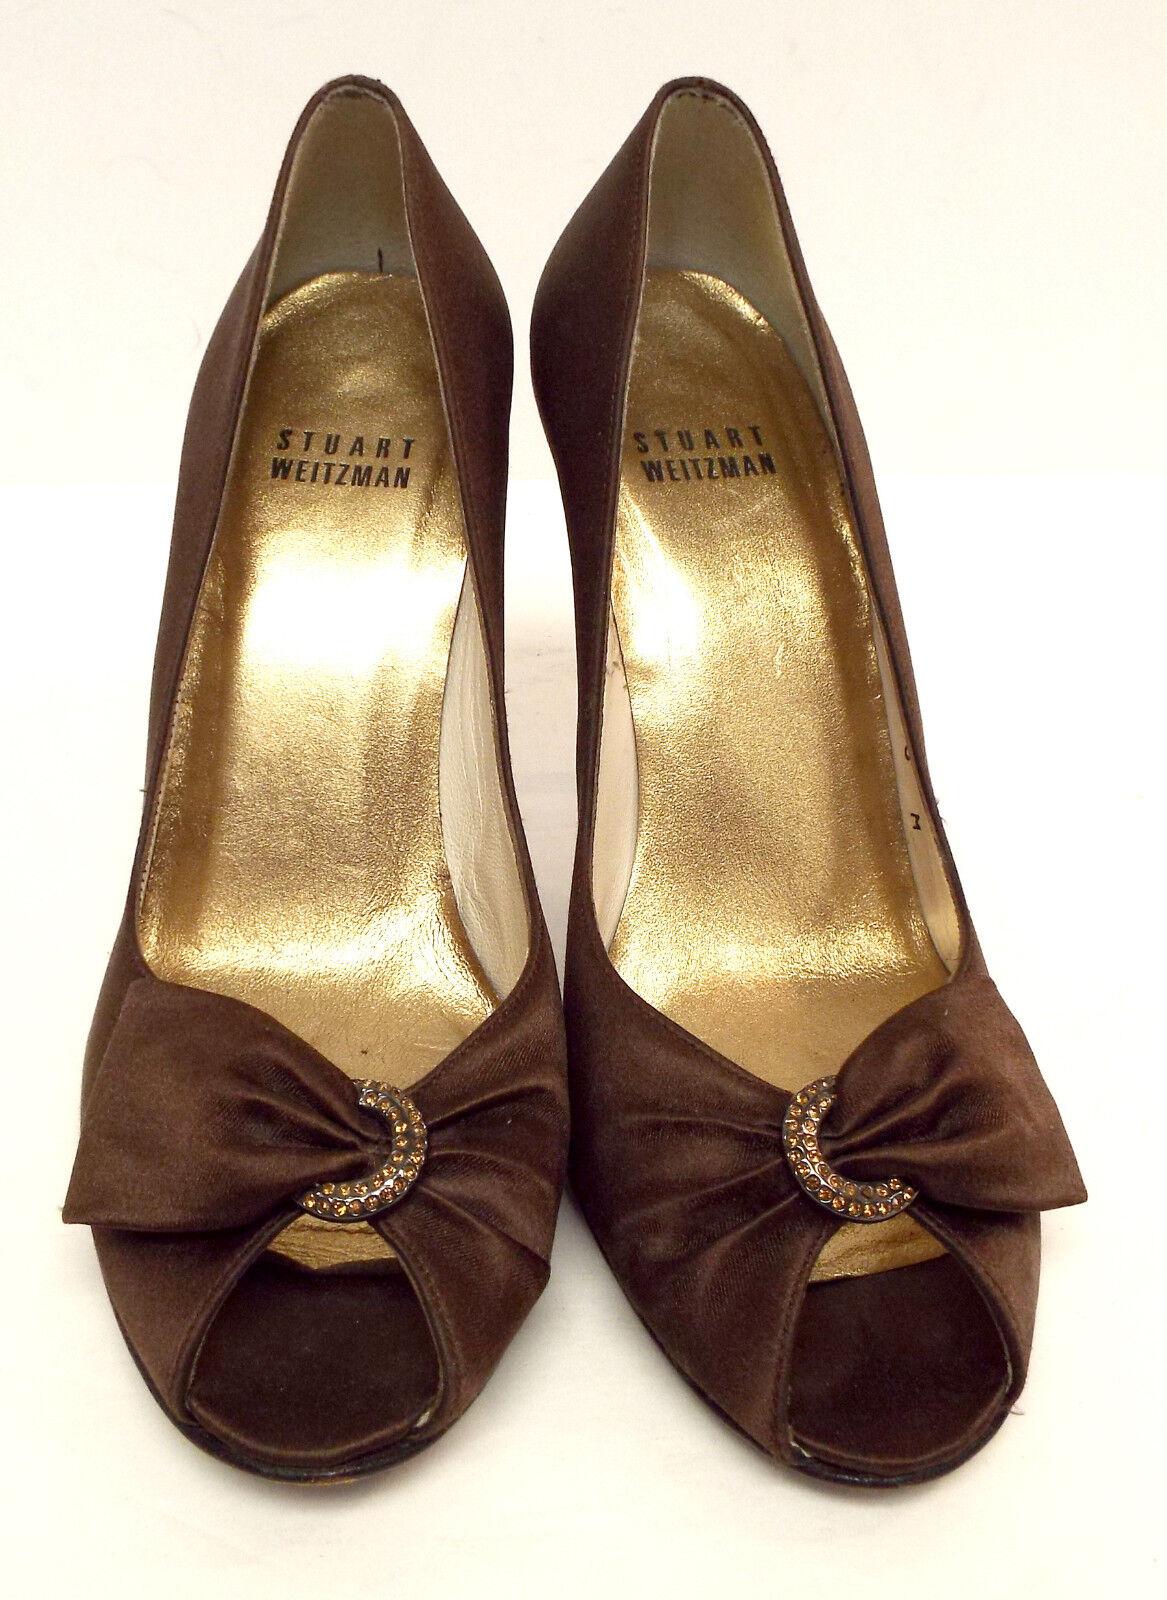 STUART WEITZMAN Größe 6 Braun Bronze Satin Peep Peep Satin Toe Evening Heels Pumps Schuhes 817840